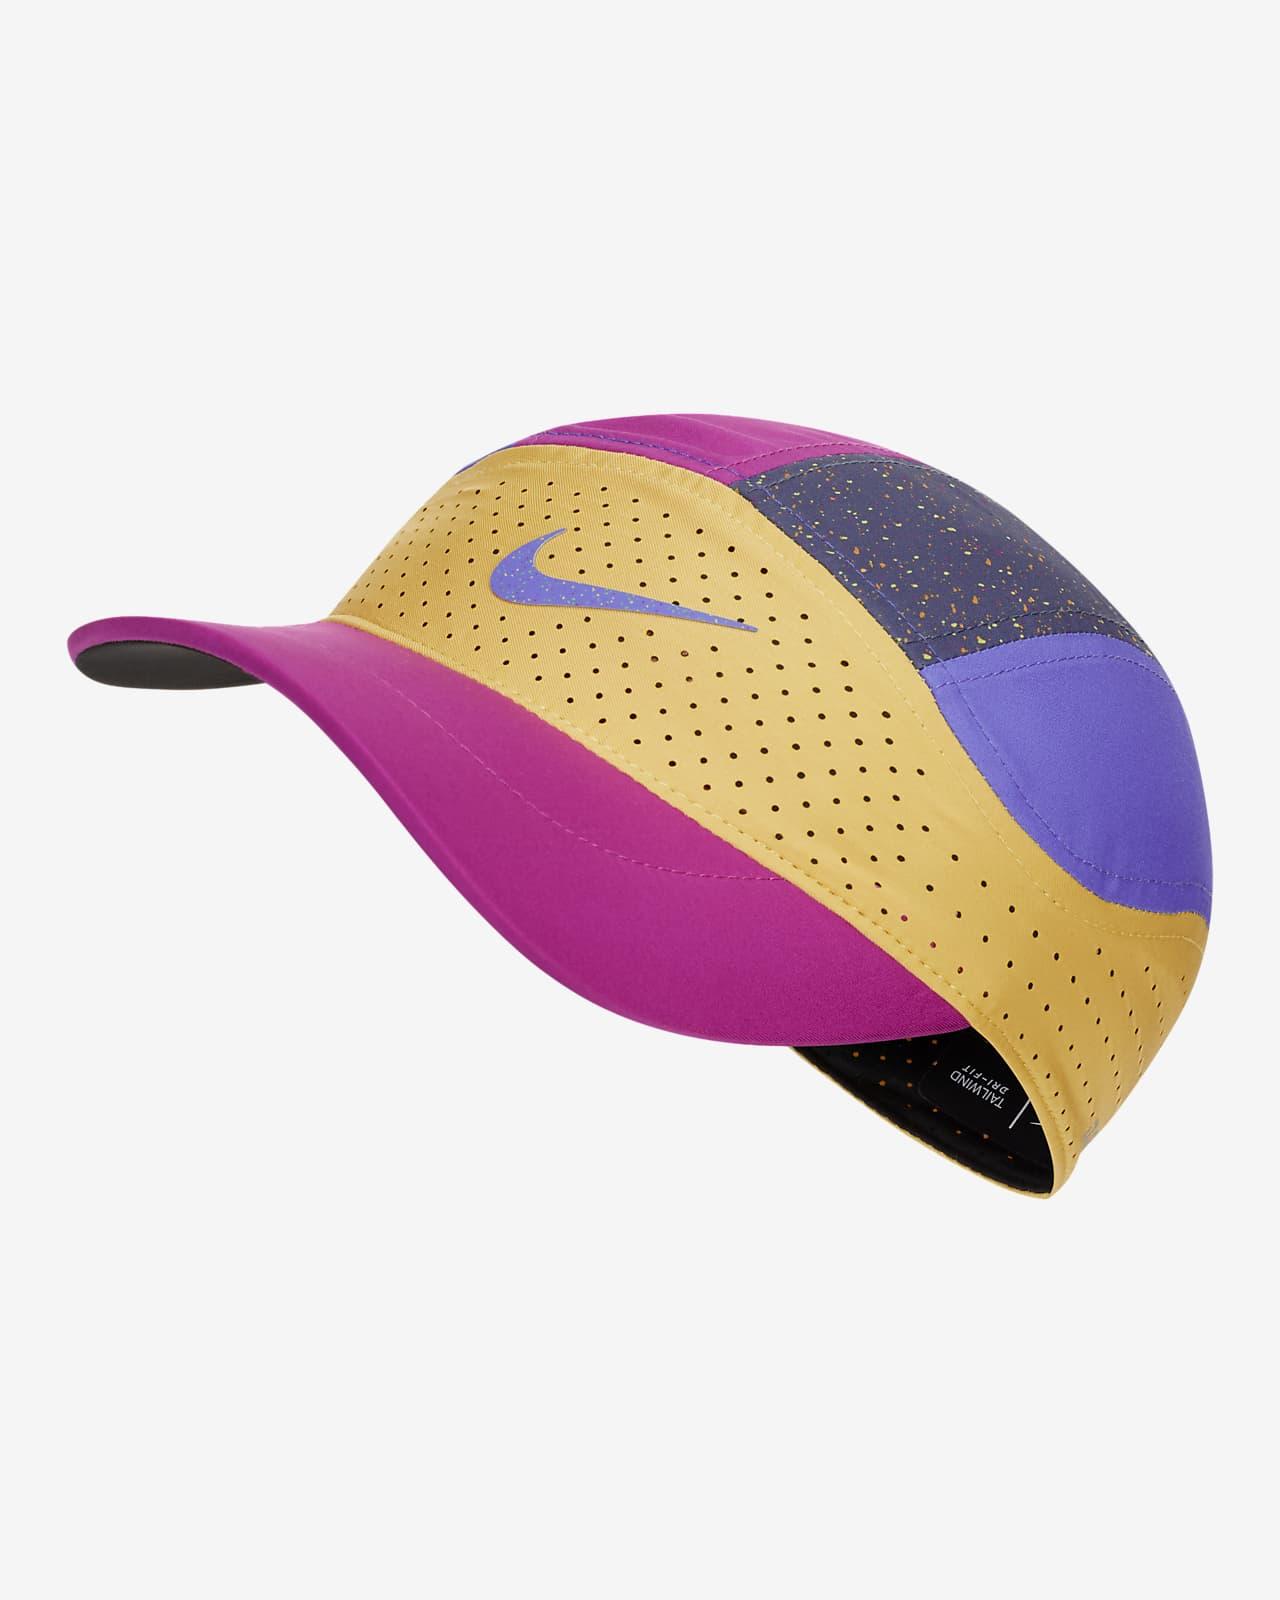 Nike Dri-FIT AeroBill Tailwind Women's Running Cap